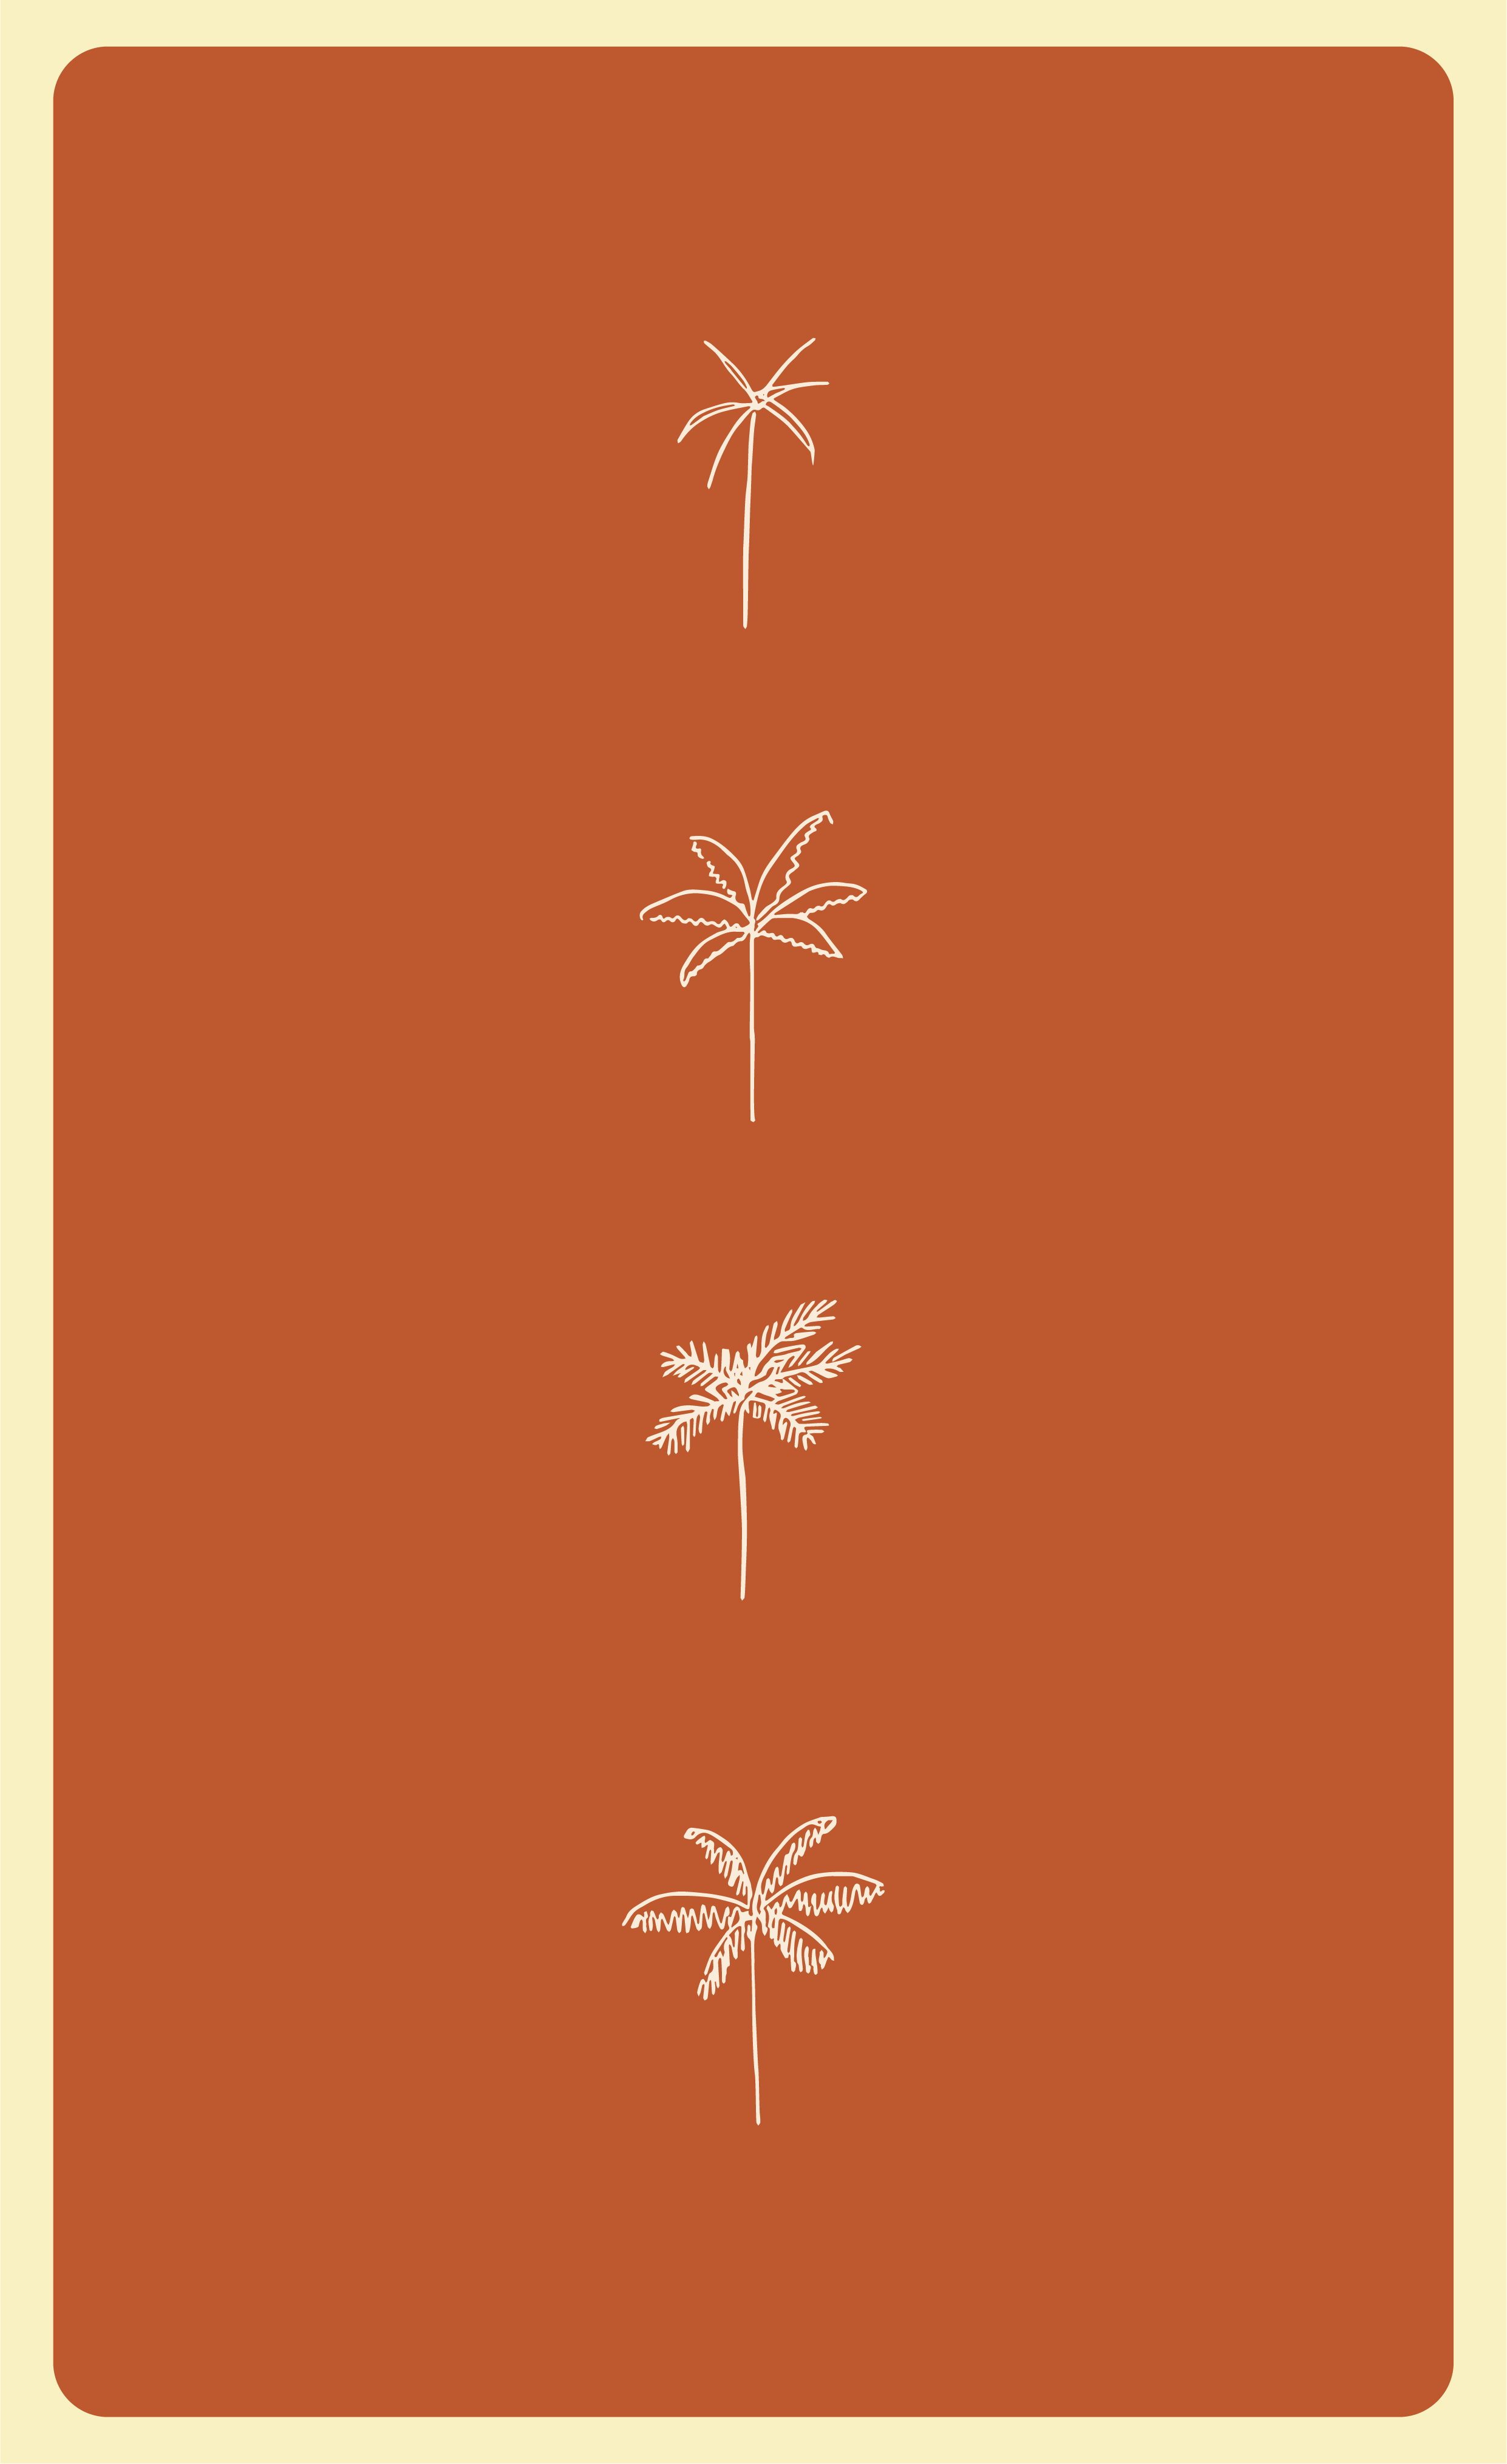 Icon illustration concept designs for brand refresh